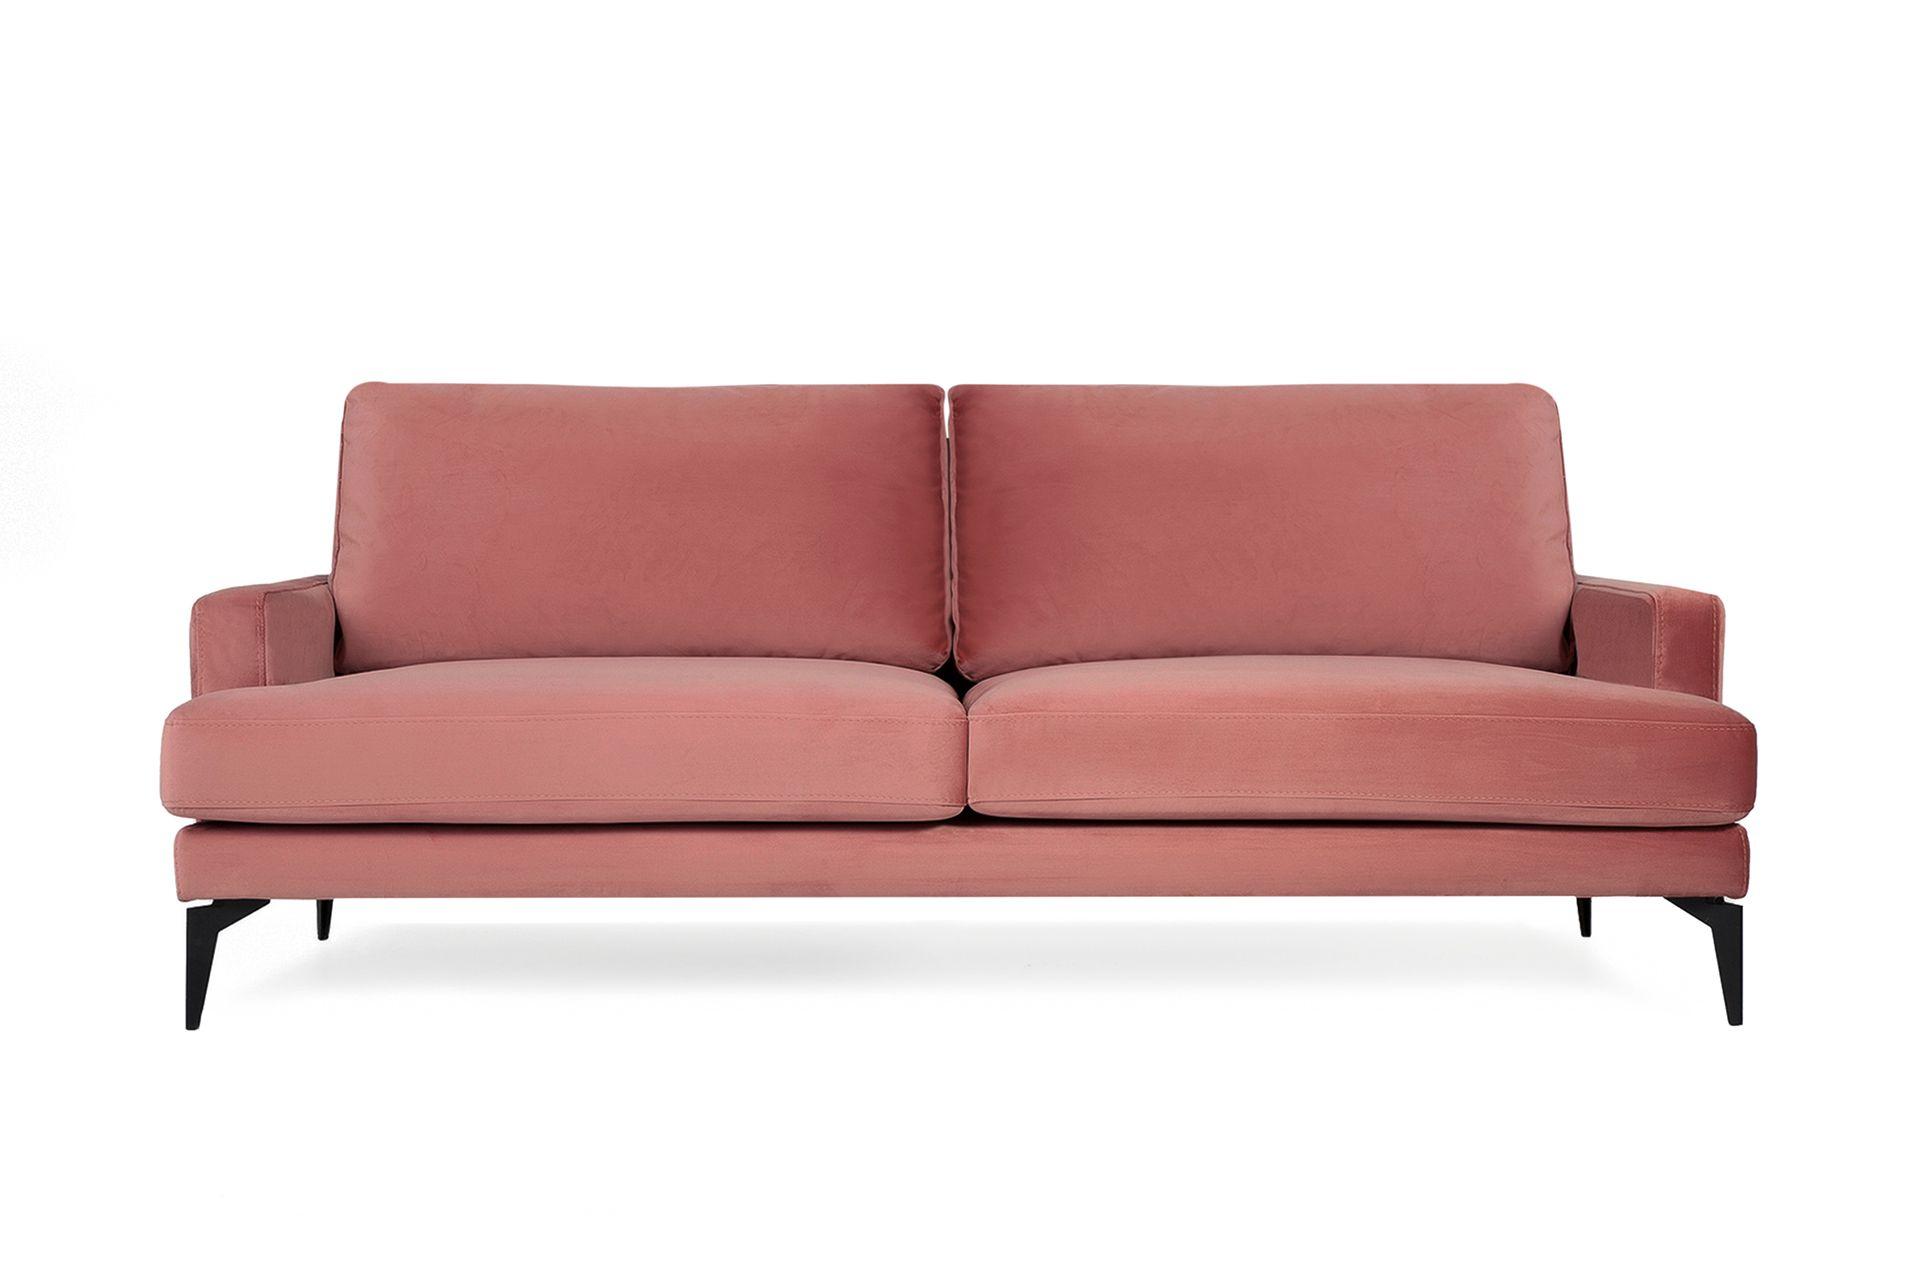 Matilda Three Seater Sofa, Dusty Rose